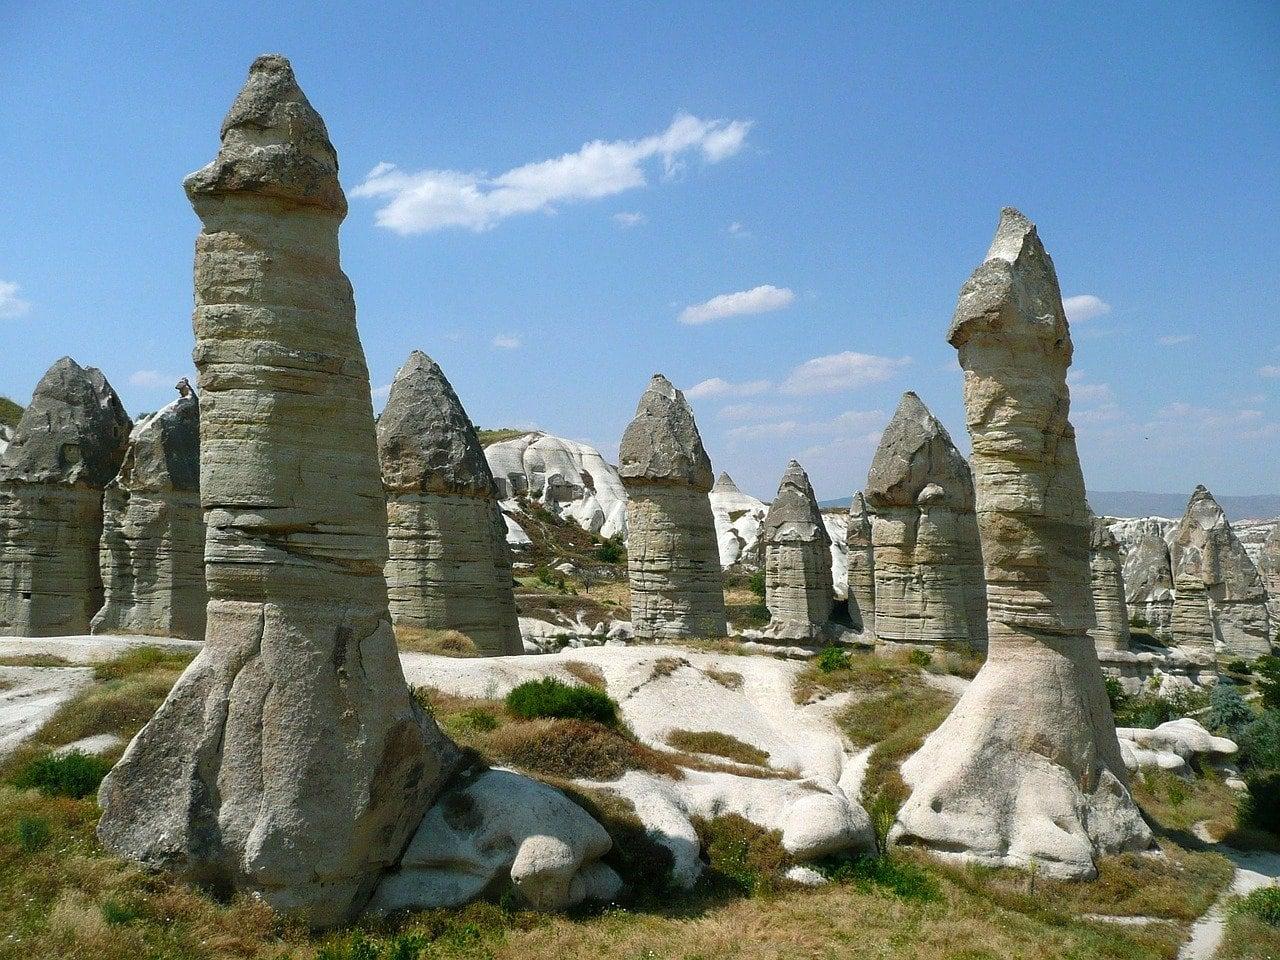 cheminée de fée en Cappadoce en Turquie